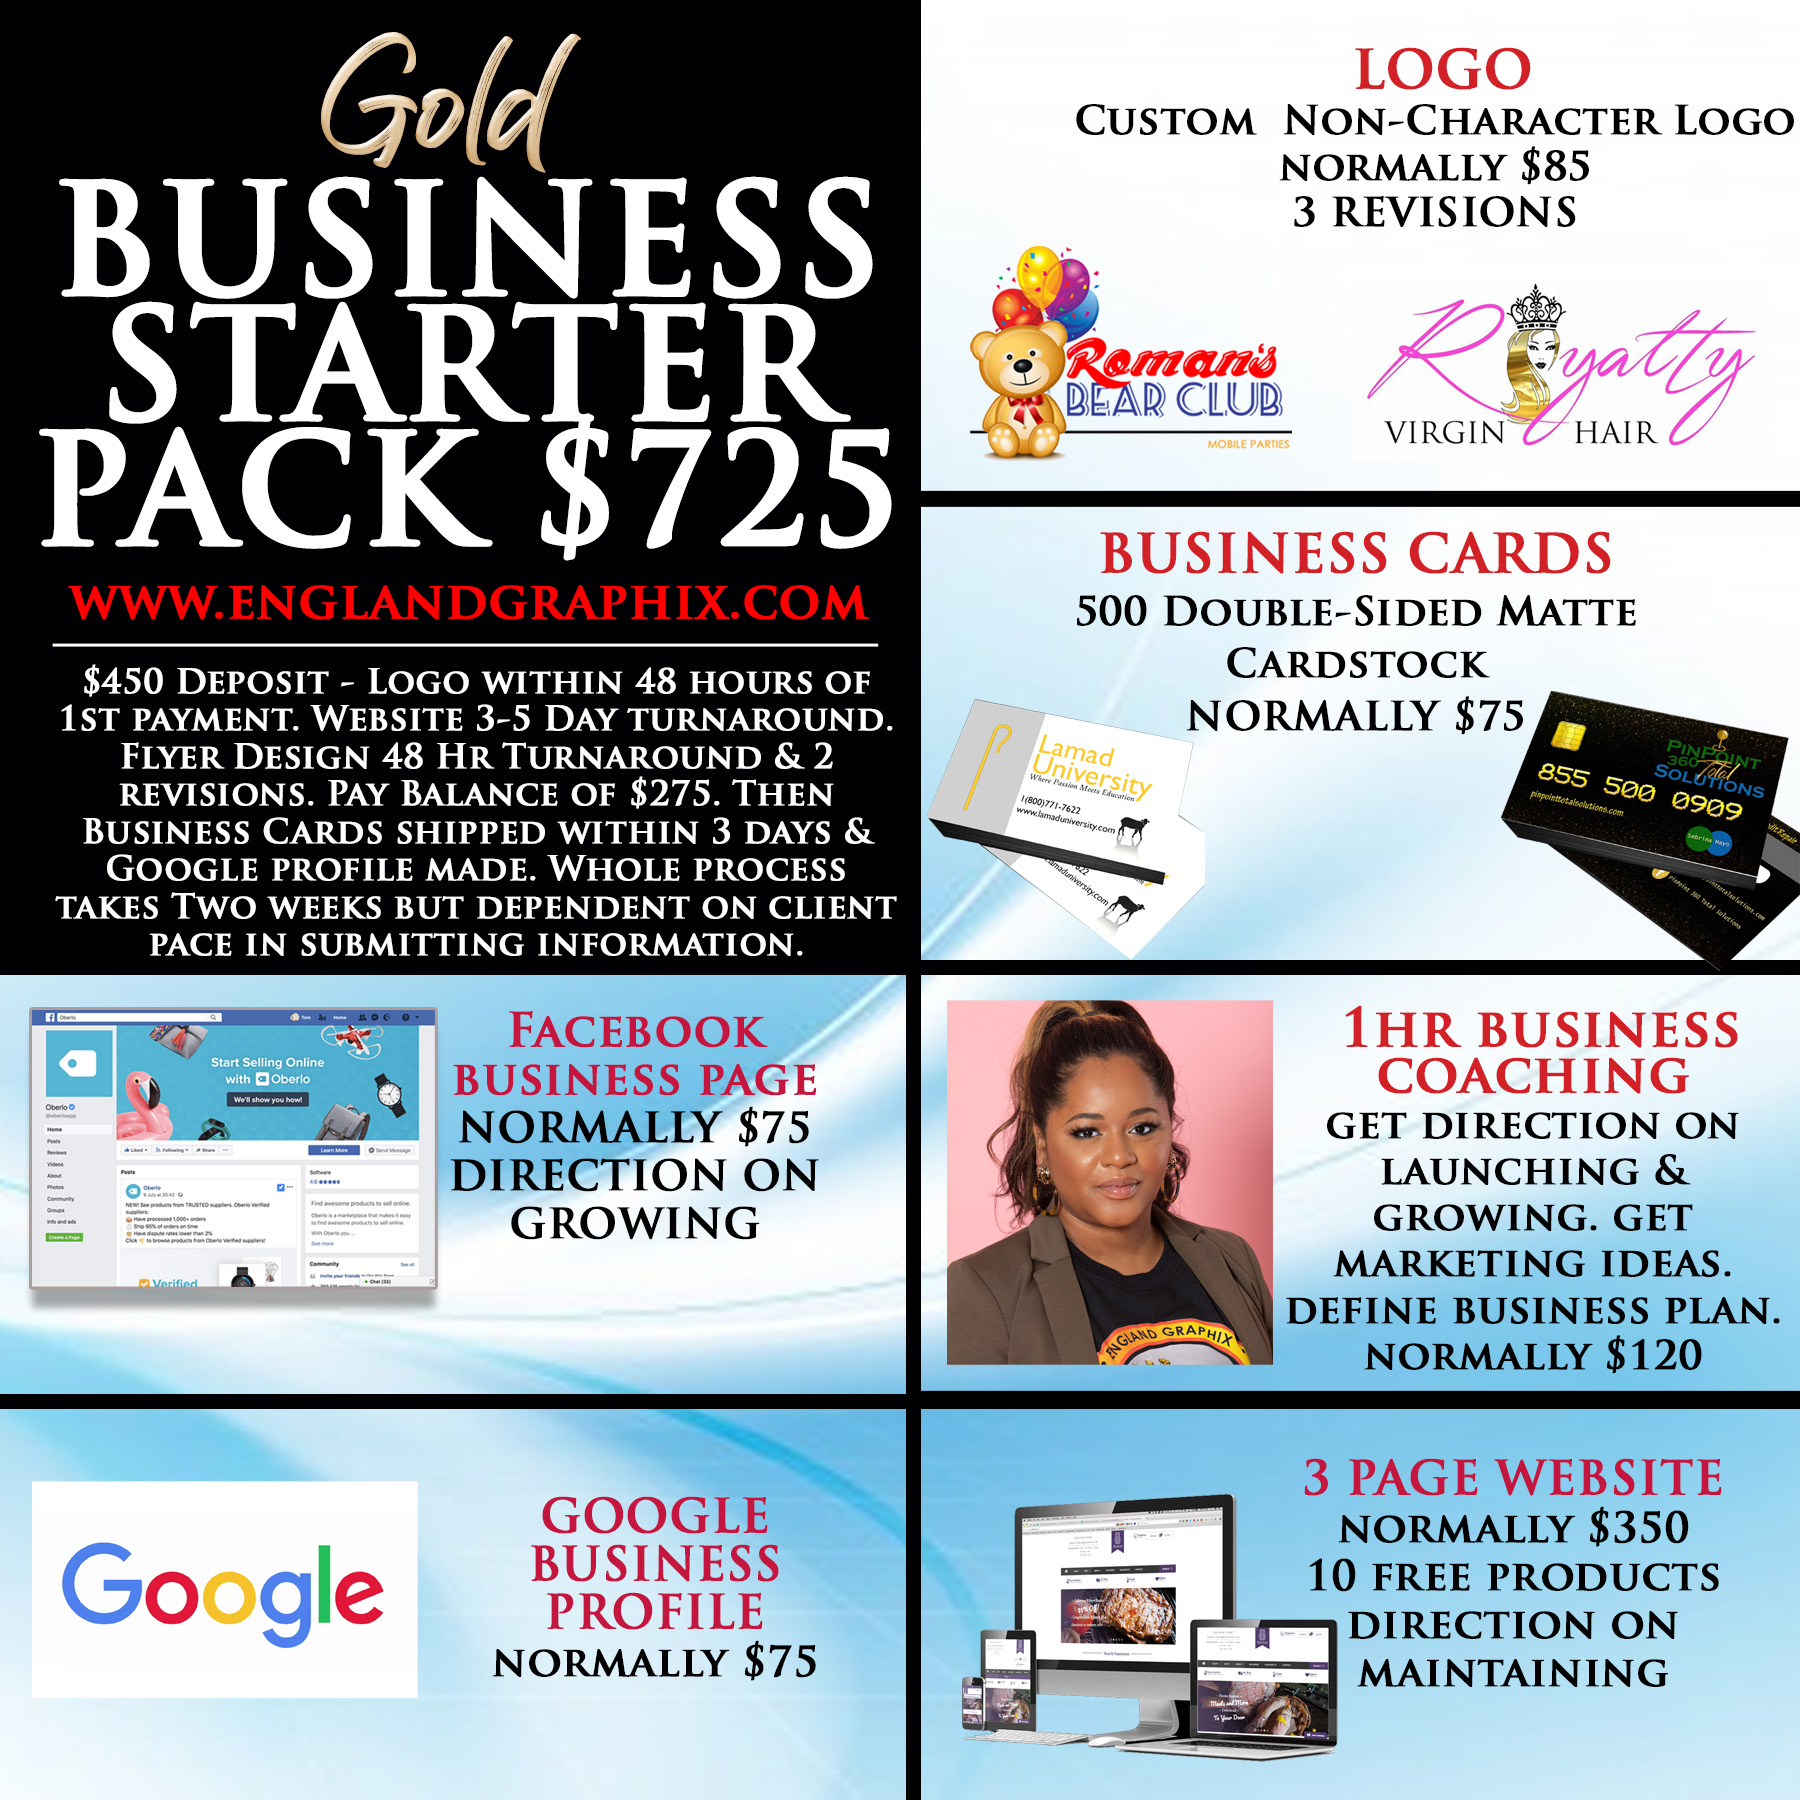 Gold Business Starter Pack